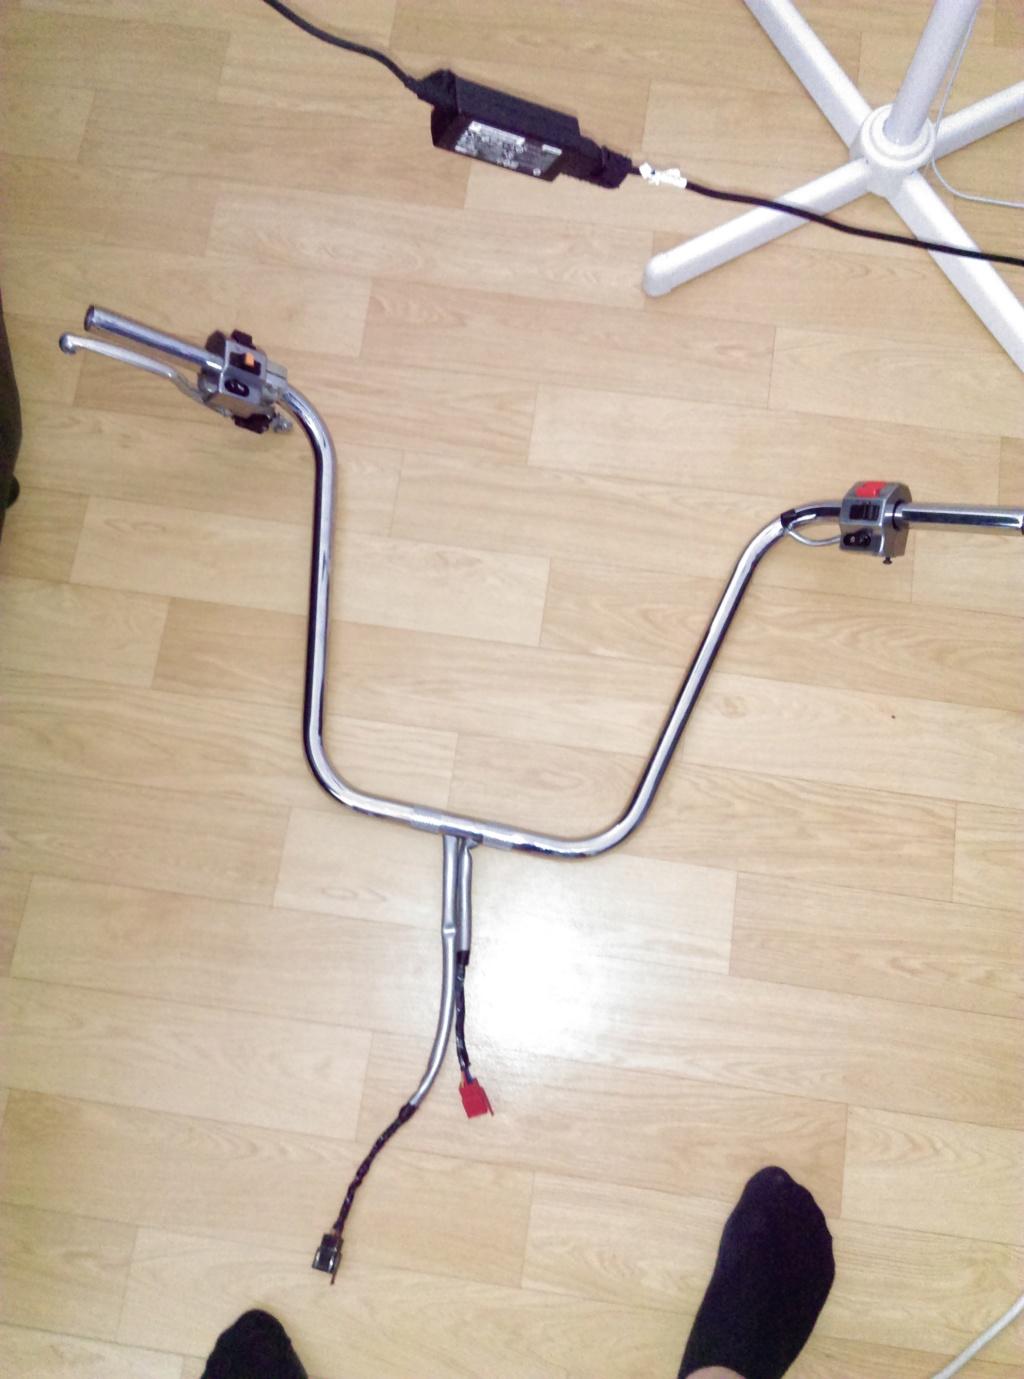 800 VN - Hard Knock Imag1627